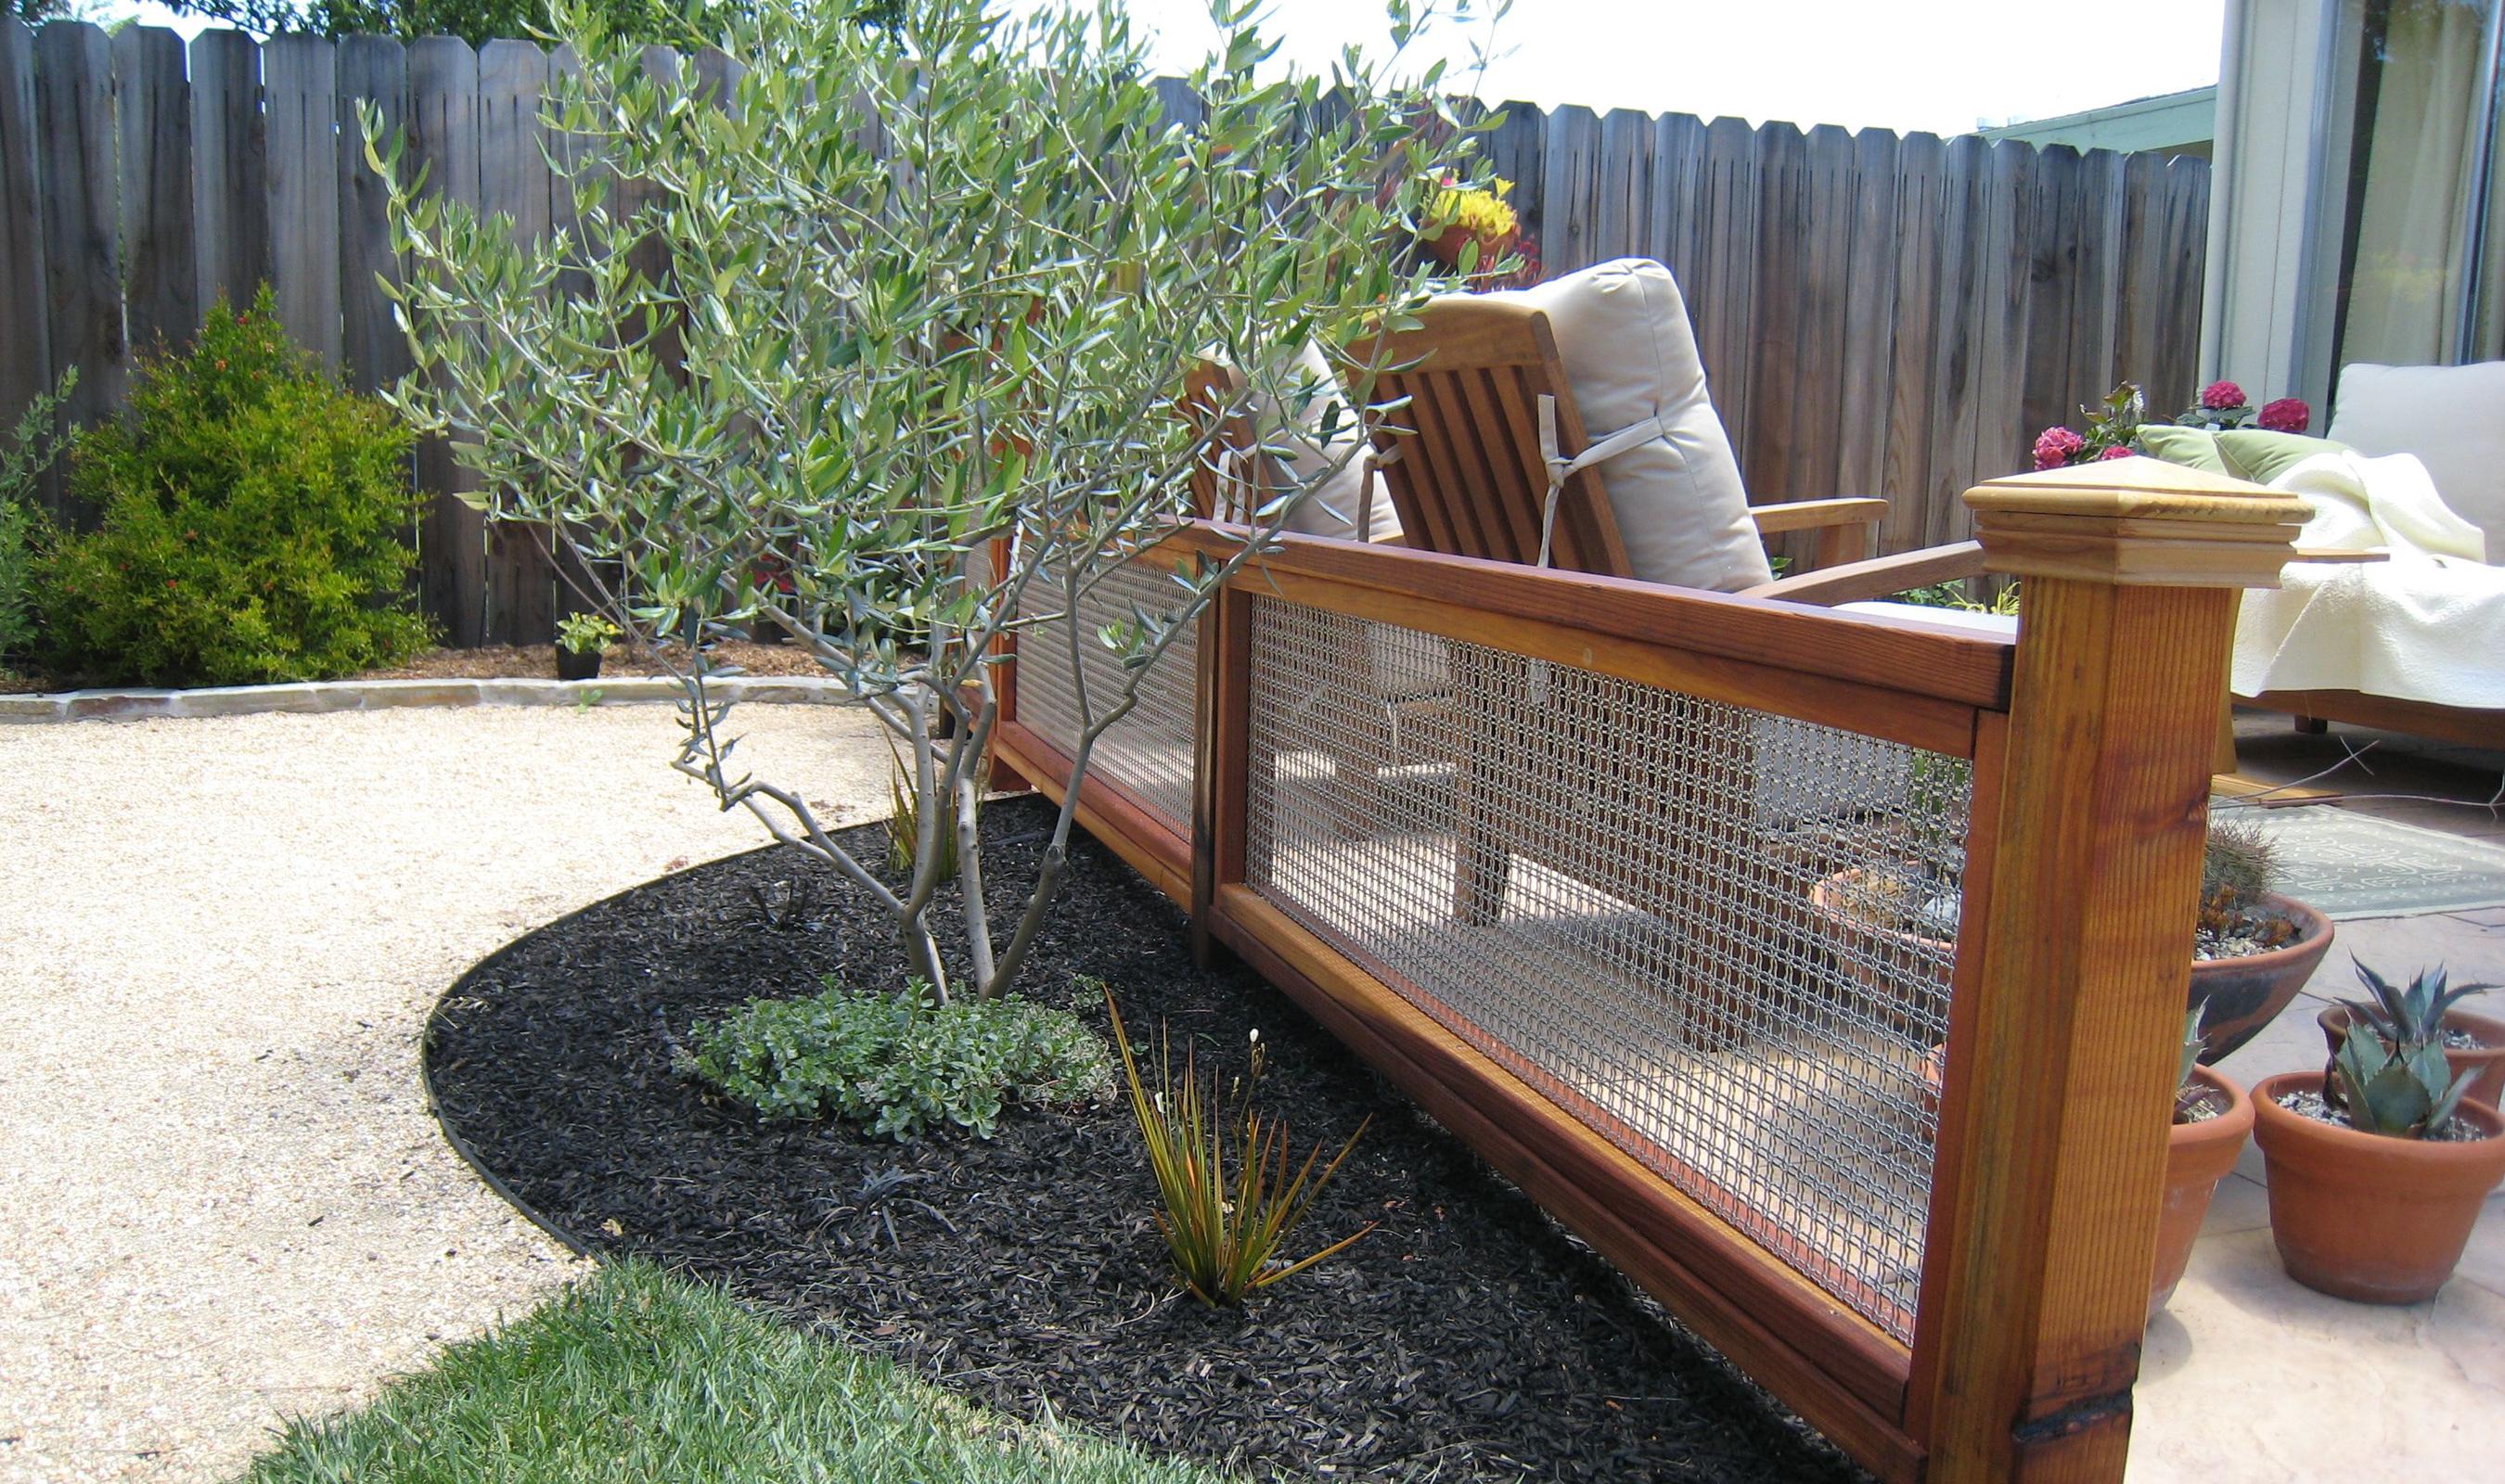 DIY Backyard Fence